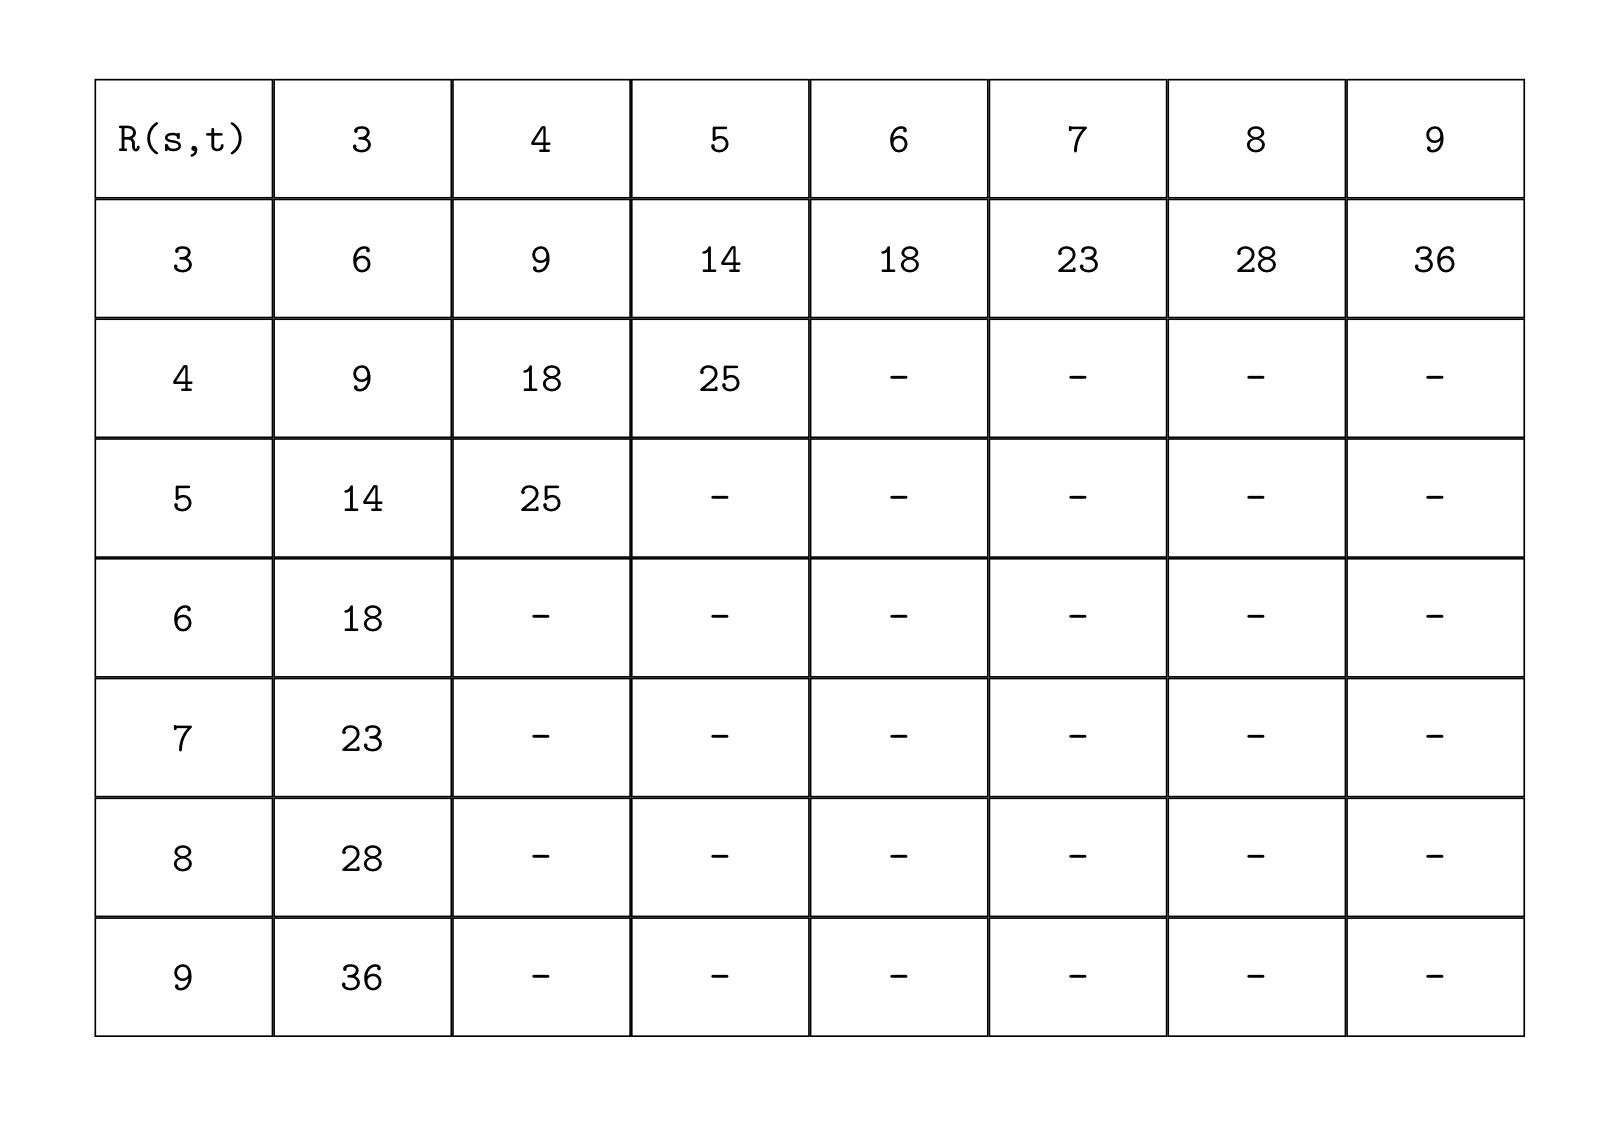 Ramsey numbers